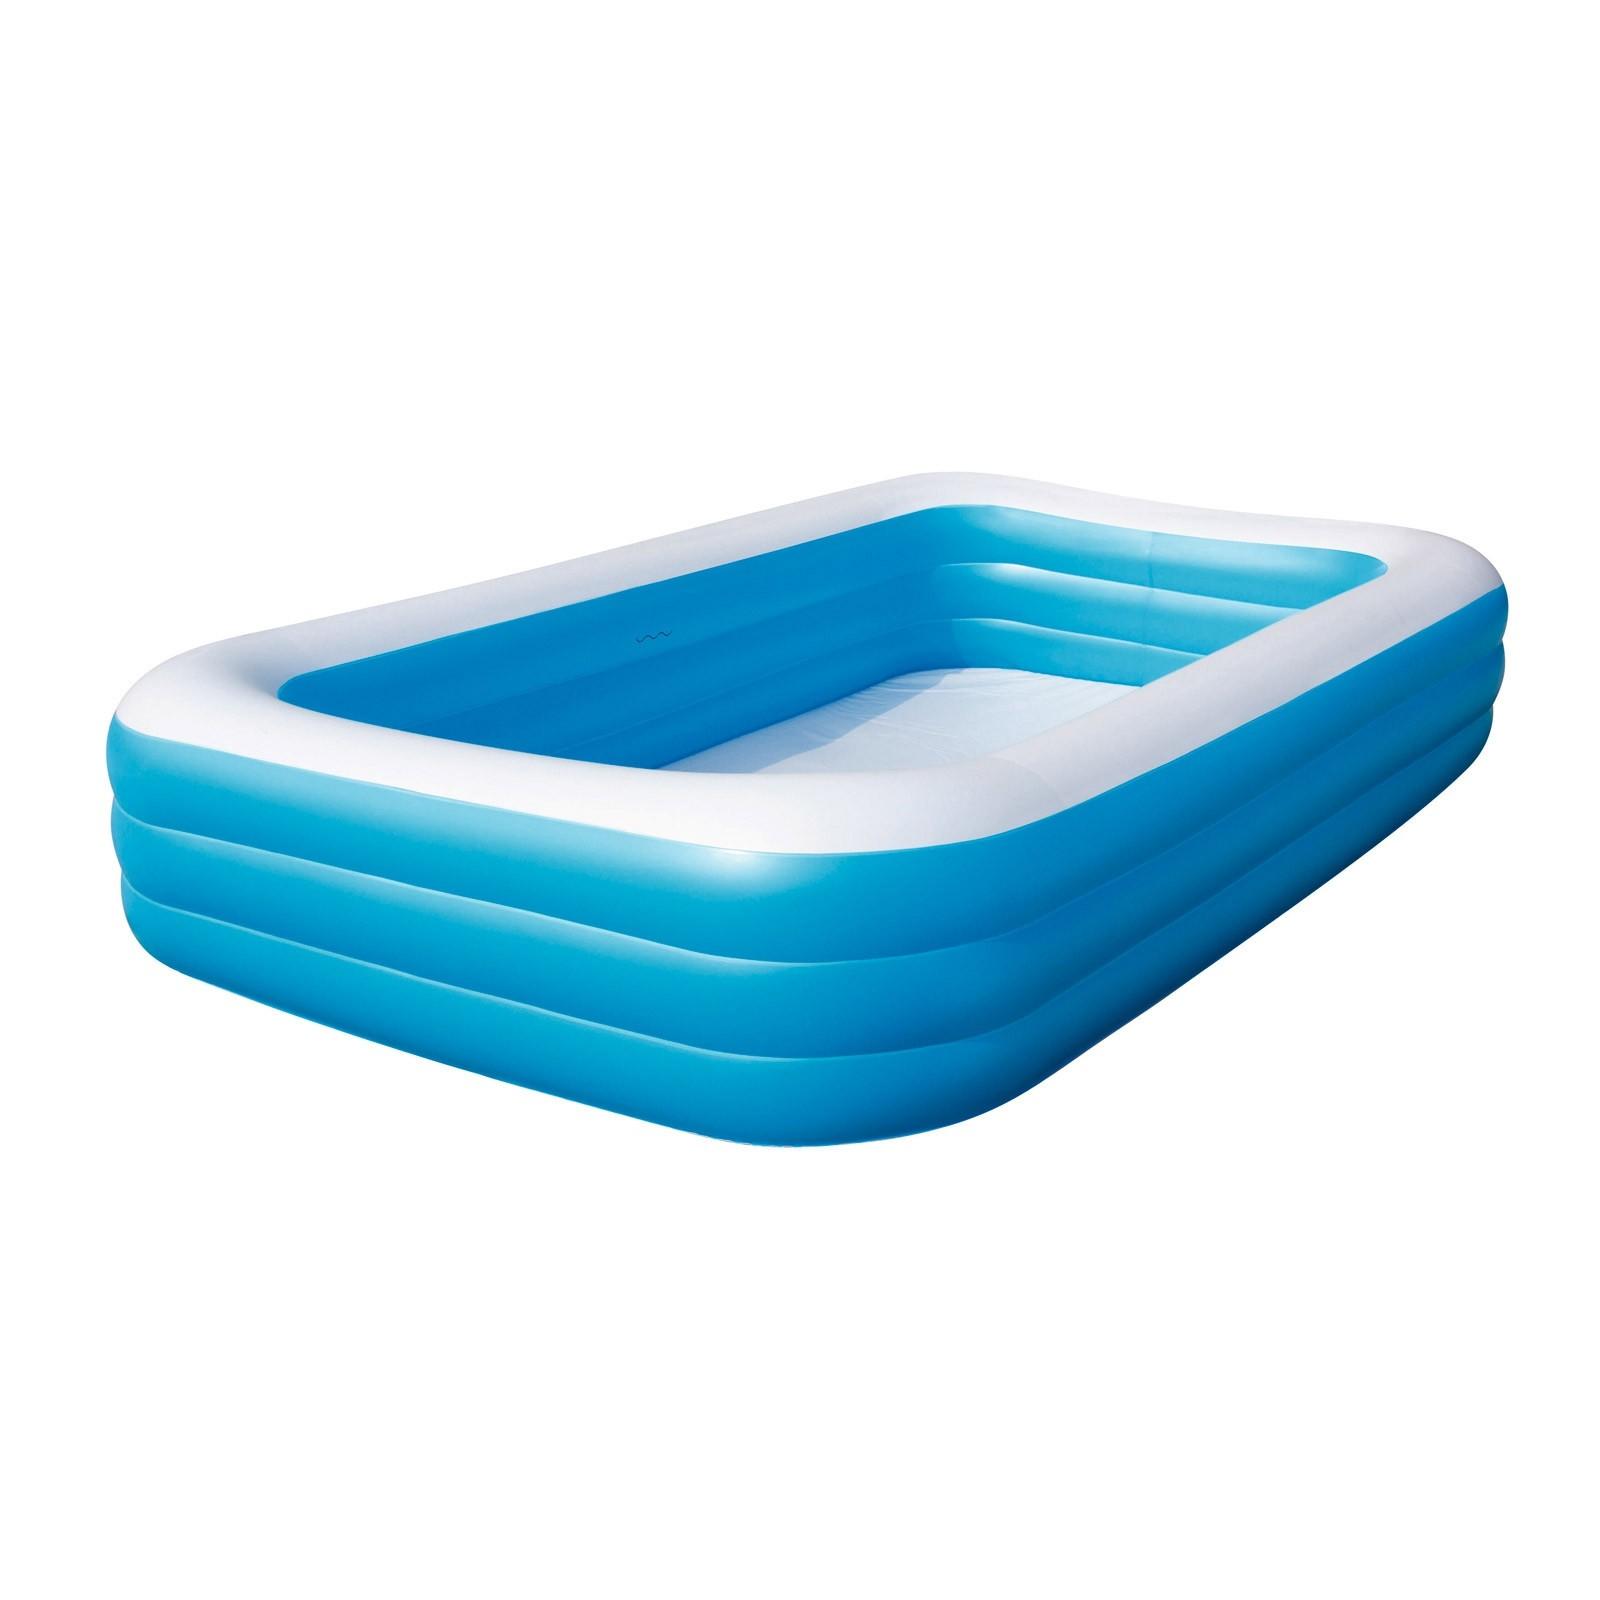 swimmingpool planschbecken swimming pool gartenpool schwimmbecken 305x183x56 cm ebay. Black Bedroom Furniture Sets. Home Design Ideas